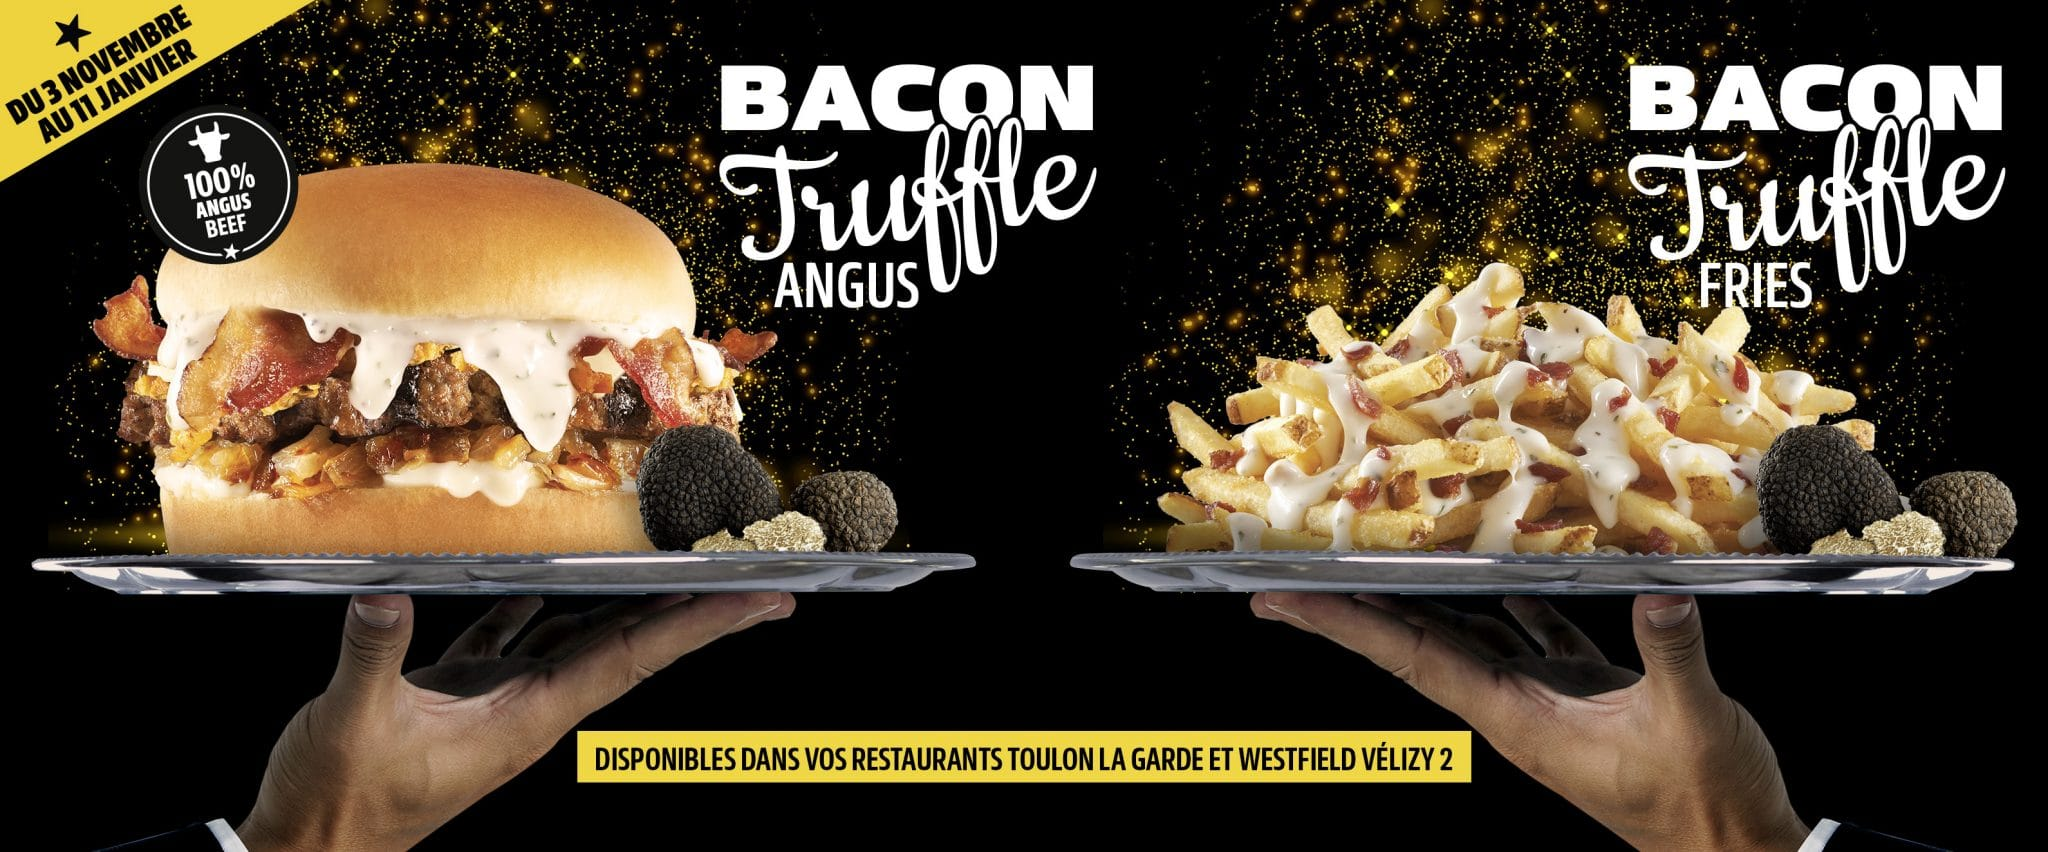 bacon truffle burger carl's jr fast food noel fêtes menu vélizy 2